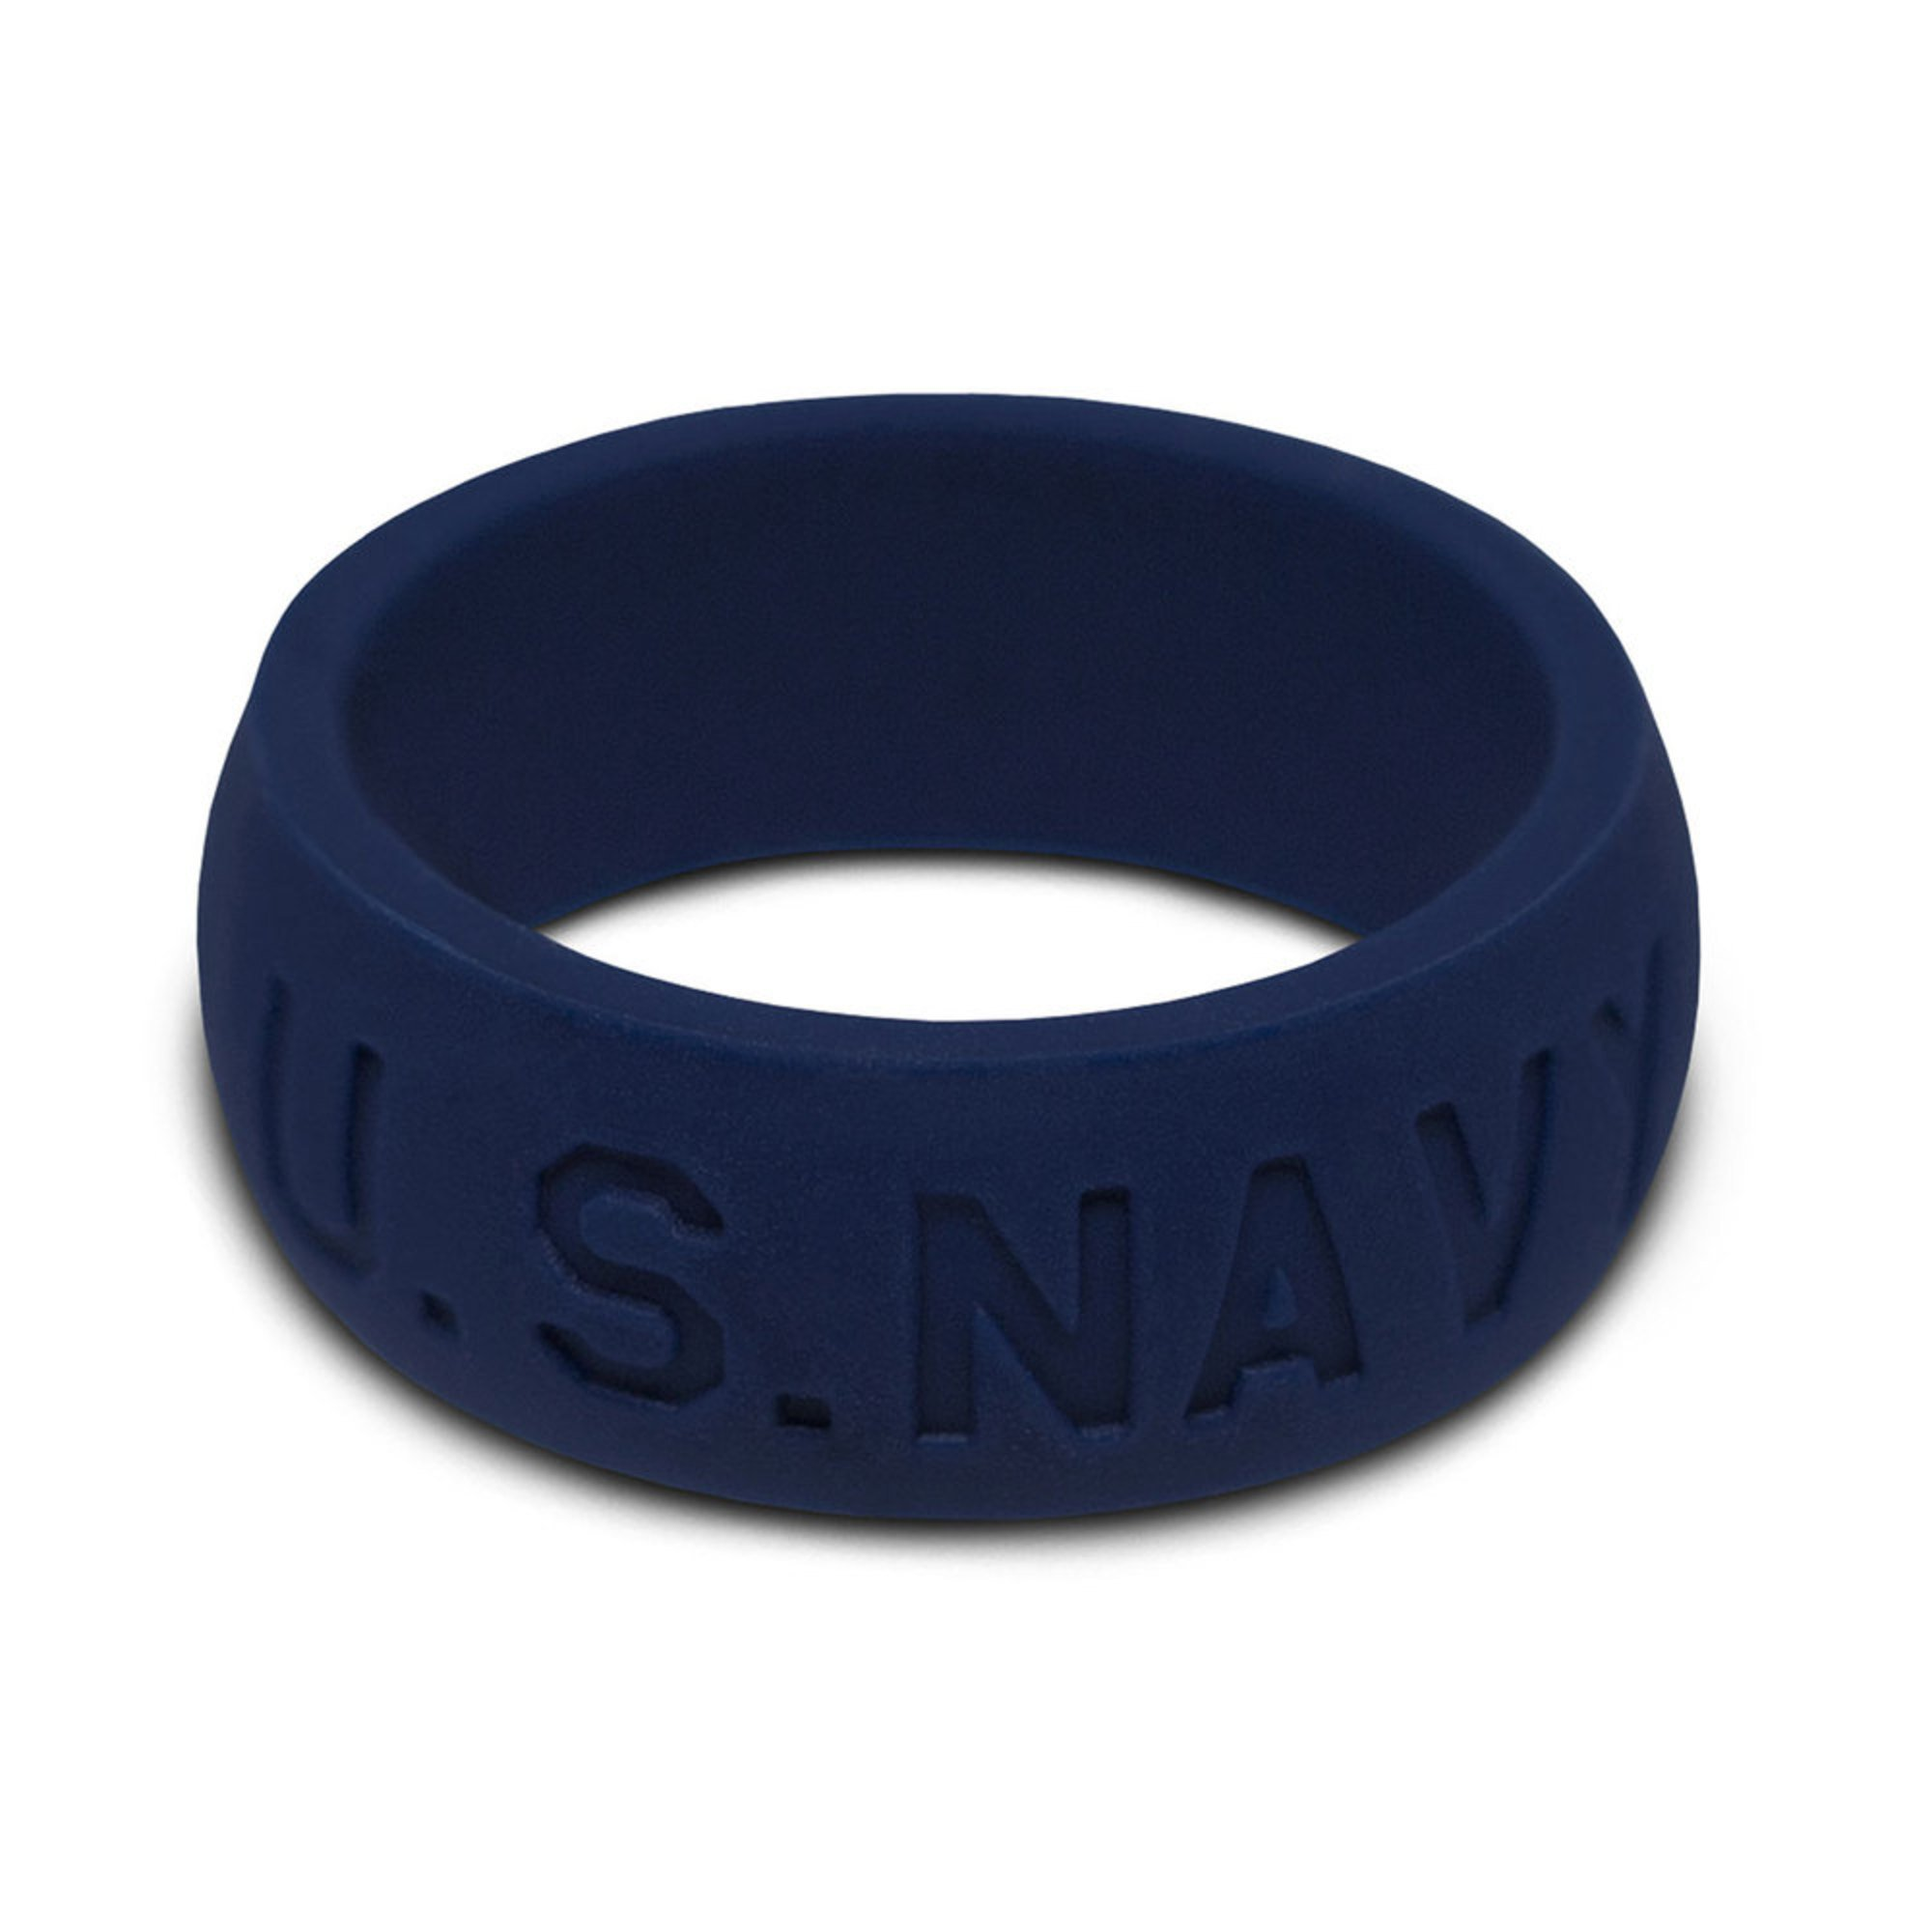 Qalo Men S United States Navy Band Navy Wedding Bands For Him